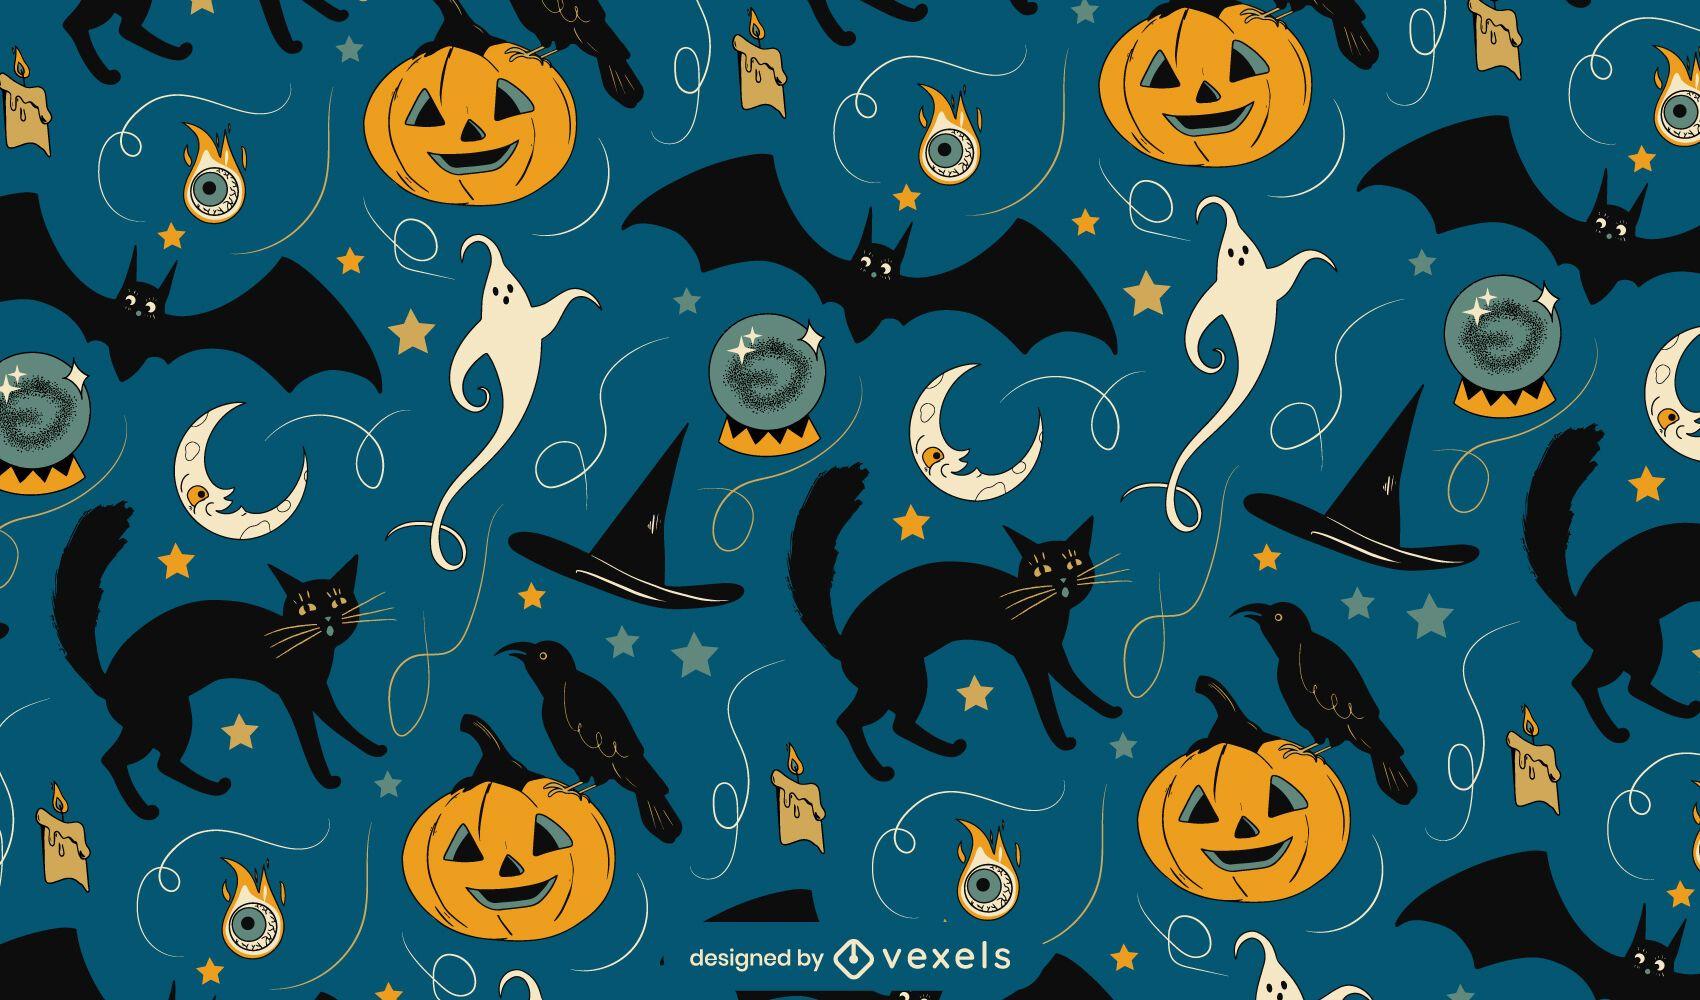 Halloween gruselige Elemente Musterdesign